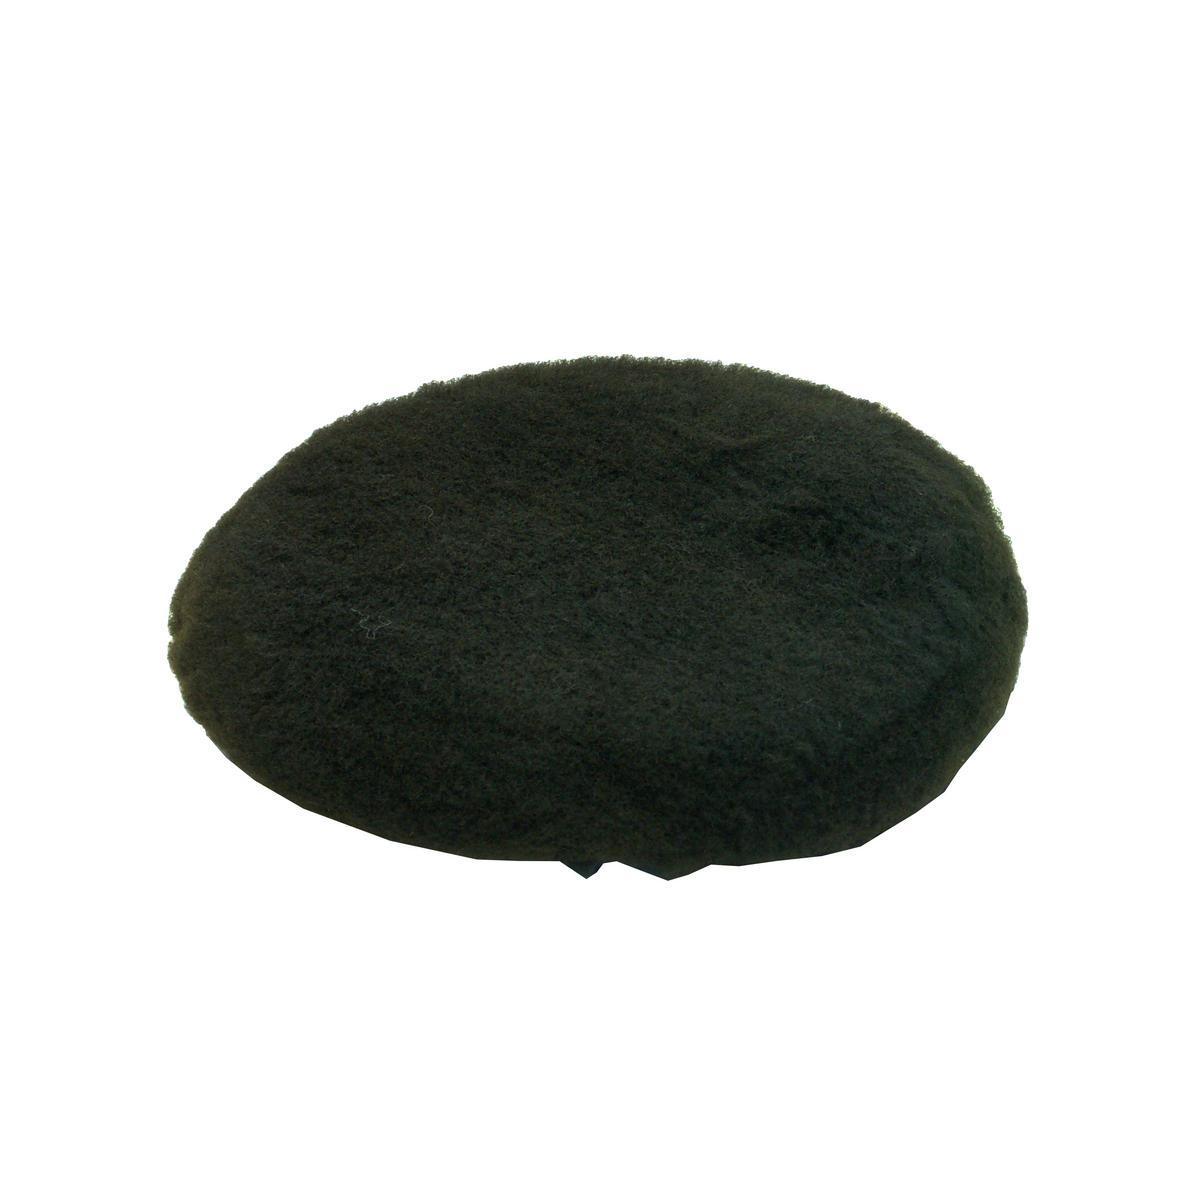 Car Cleaning 200mm Black Soft Lambs Wool Polishing Buffing Detailing Mop Head